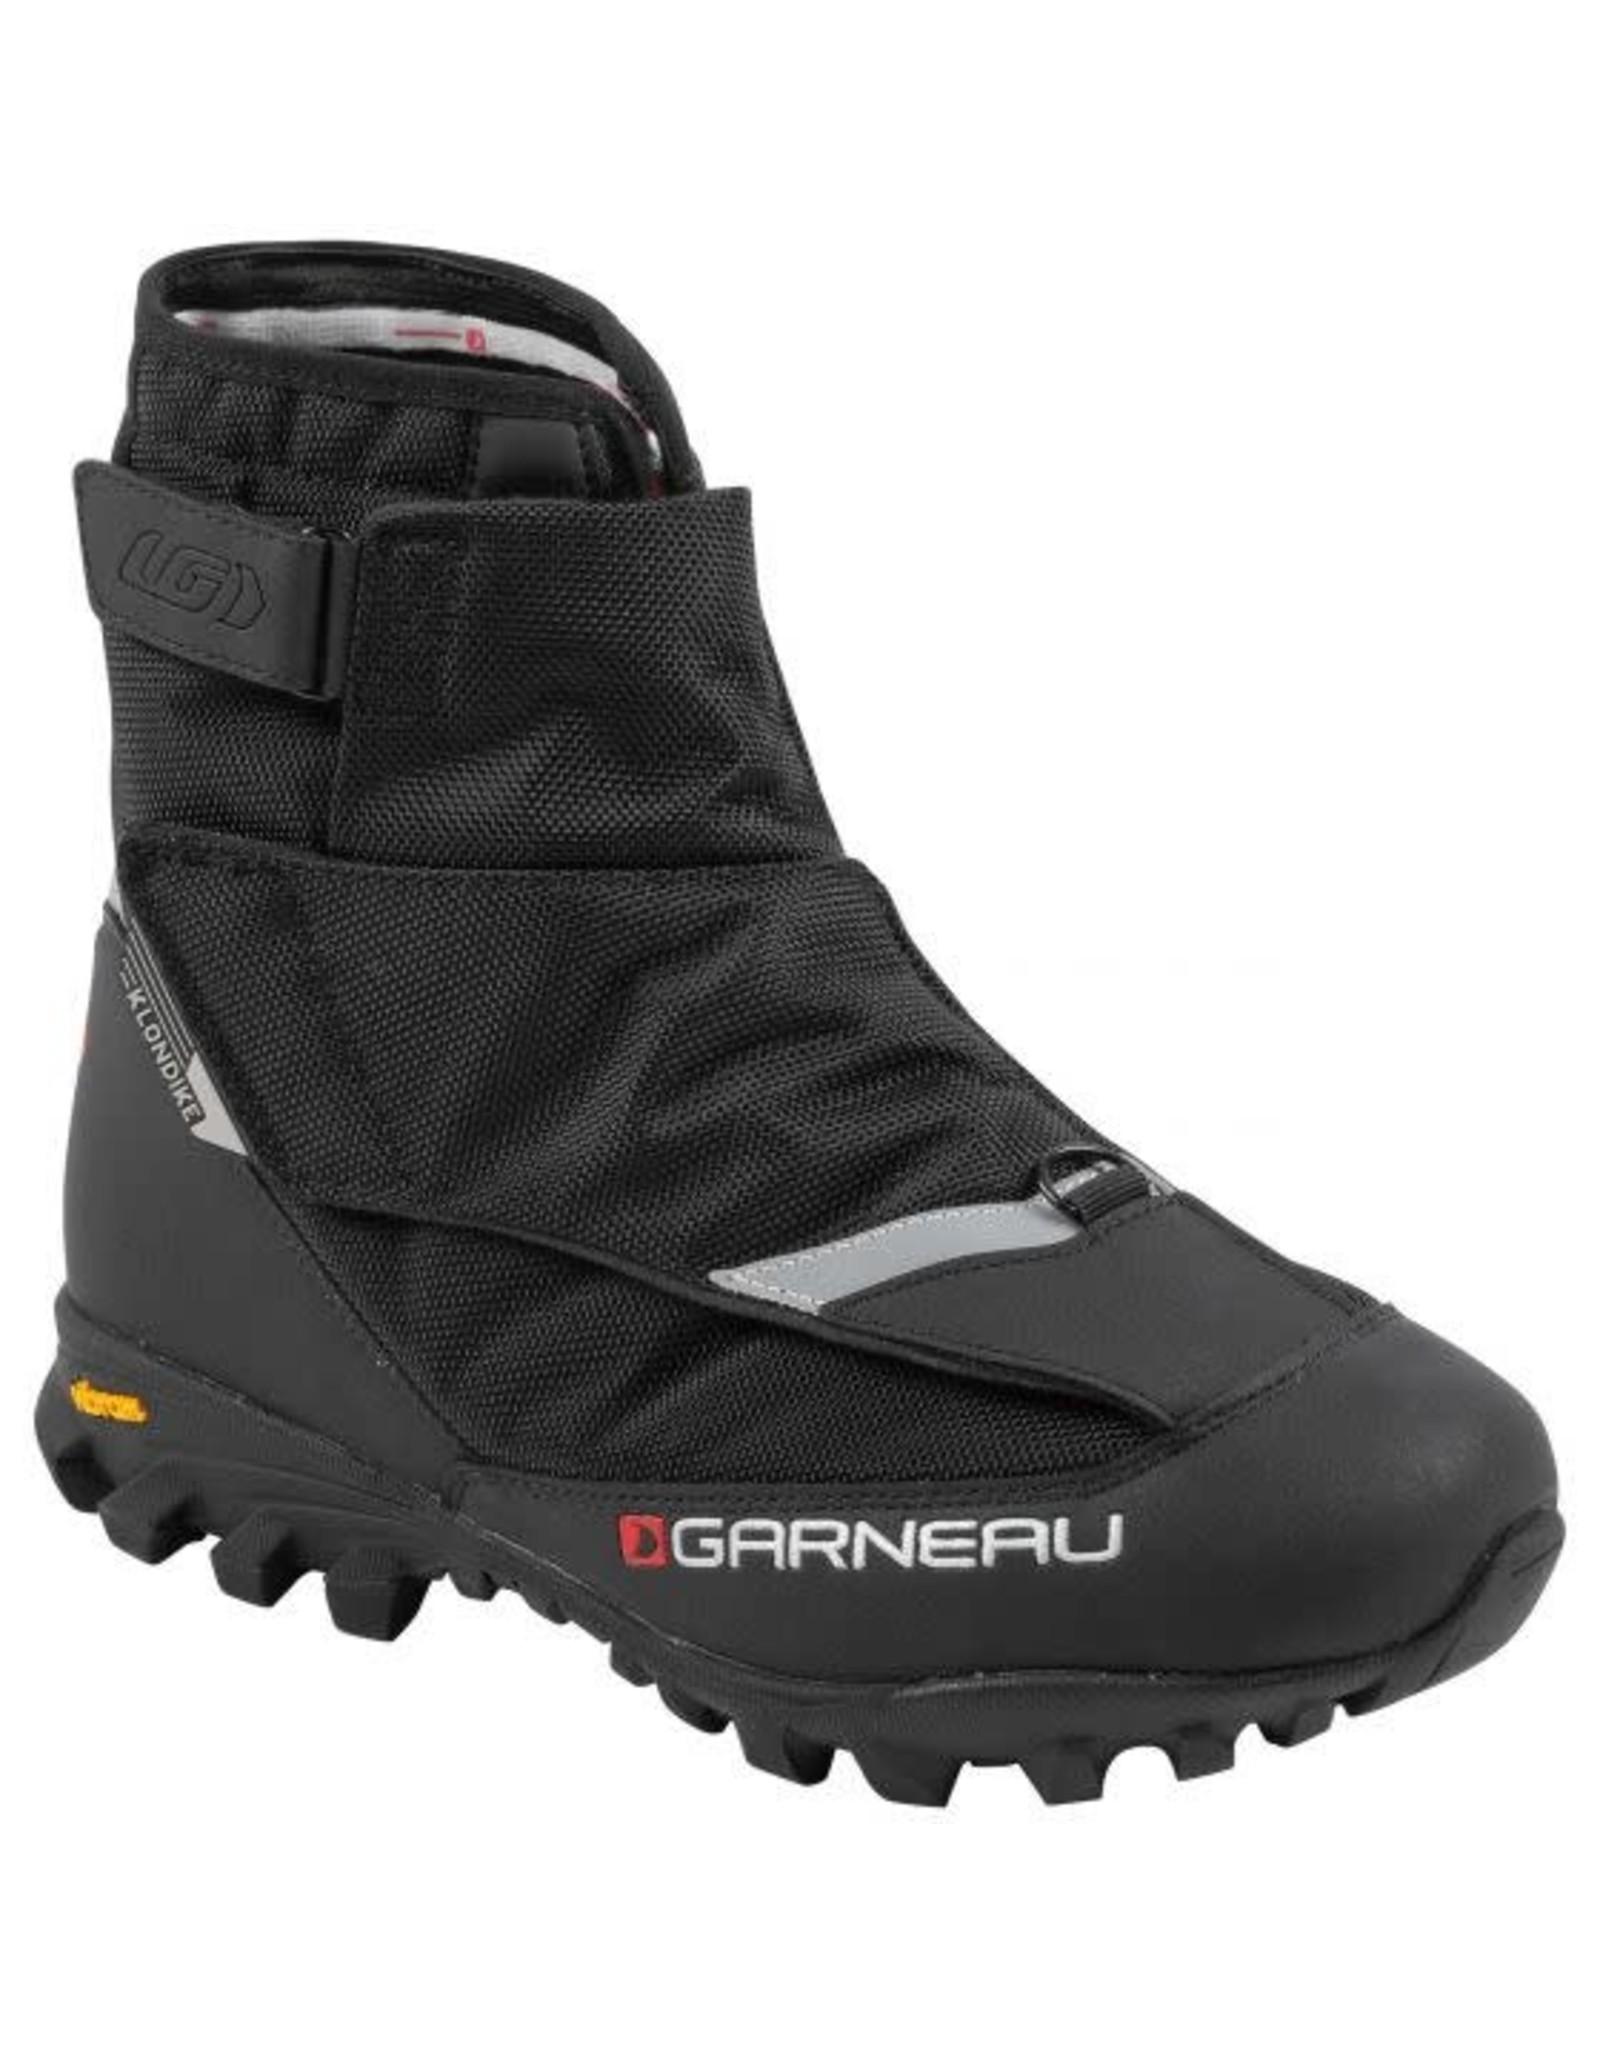 Garneau Boots Garneau Klondike